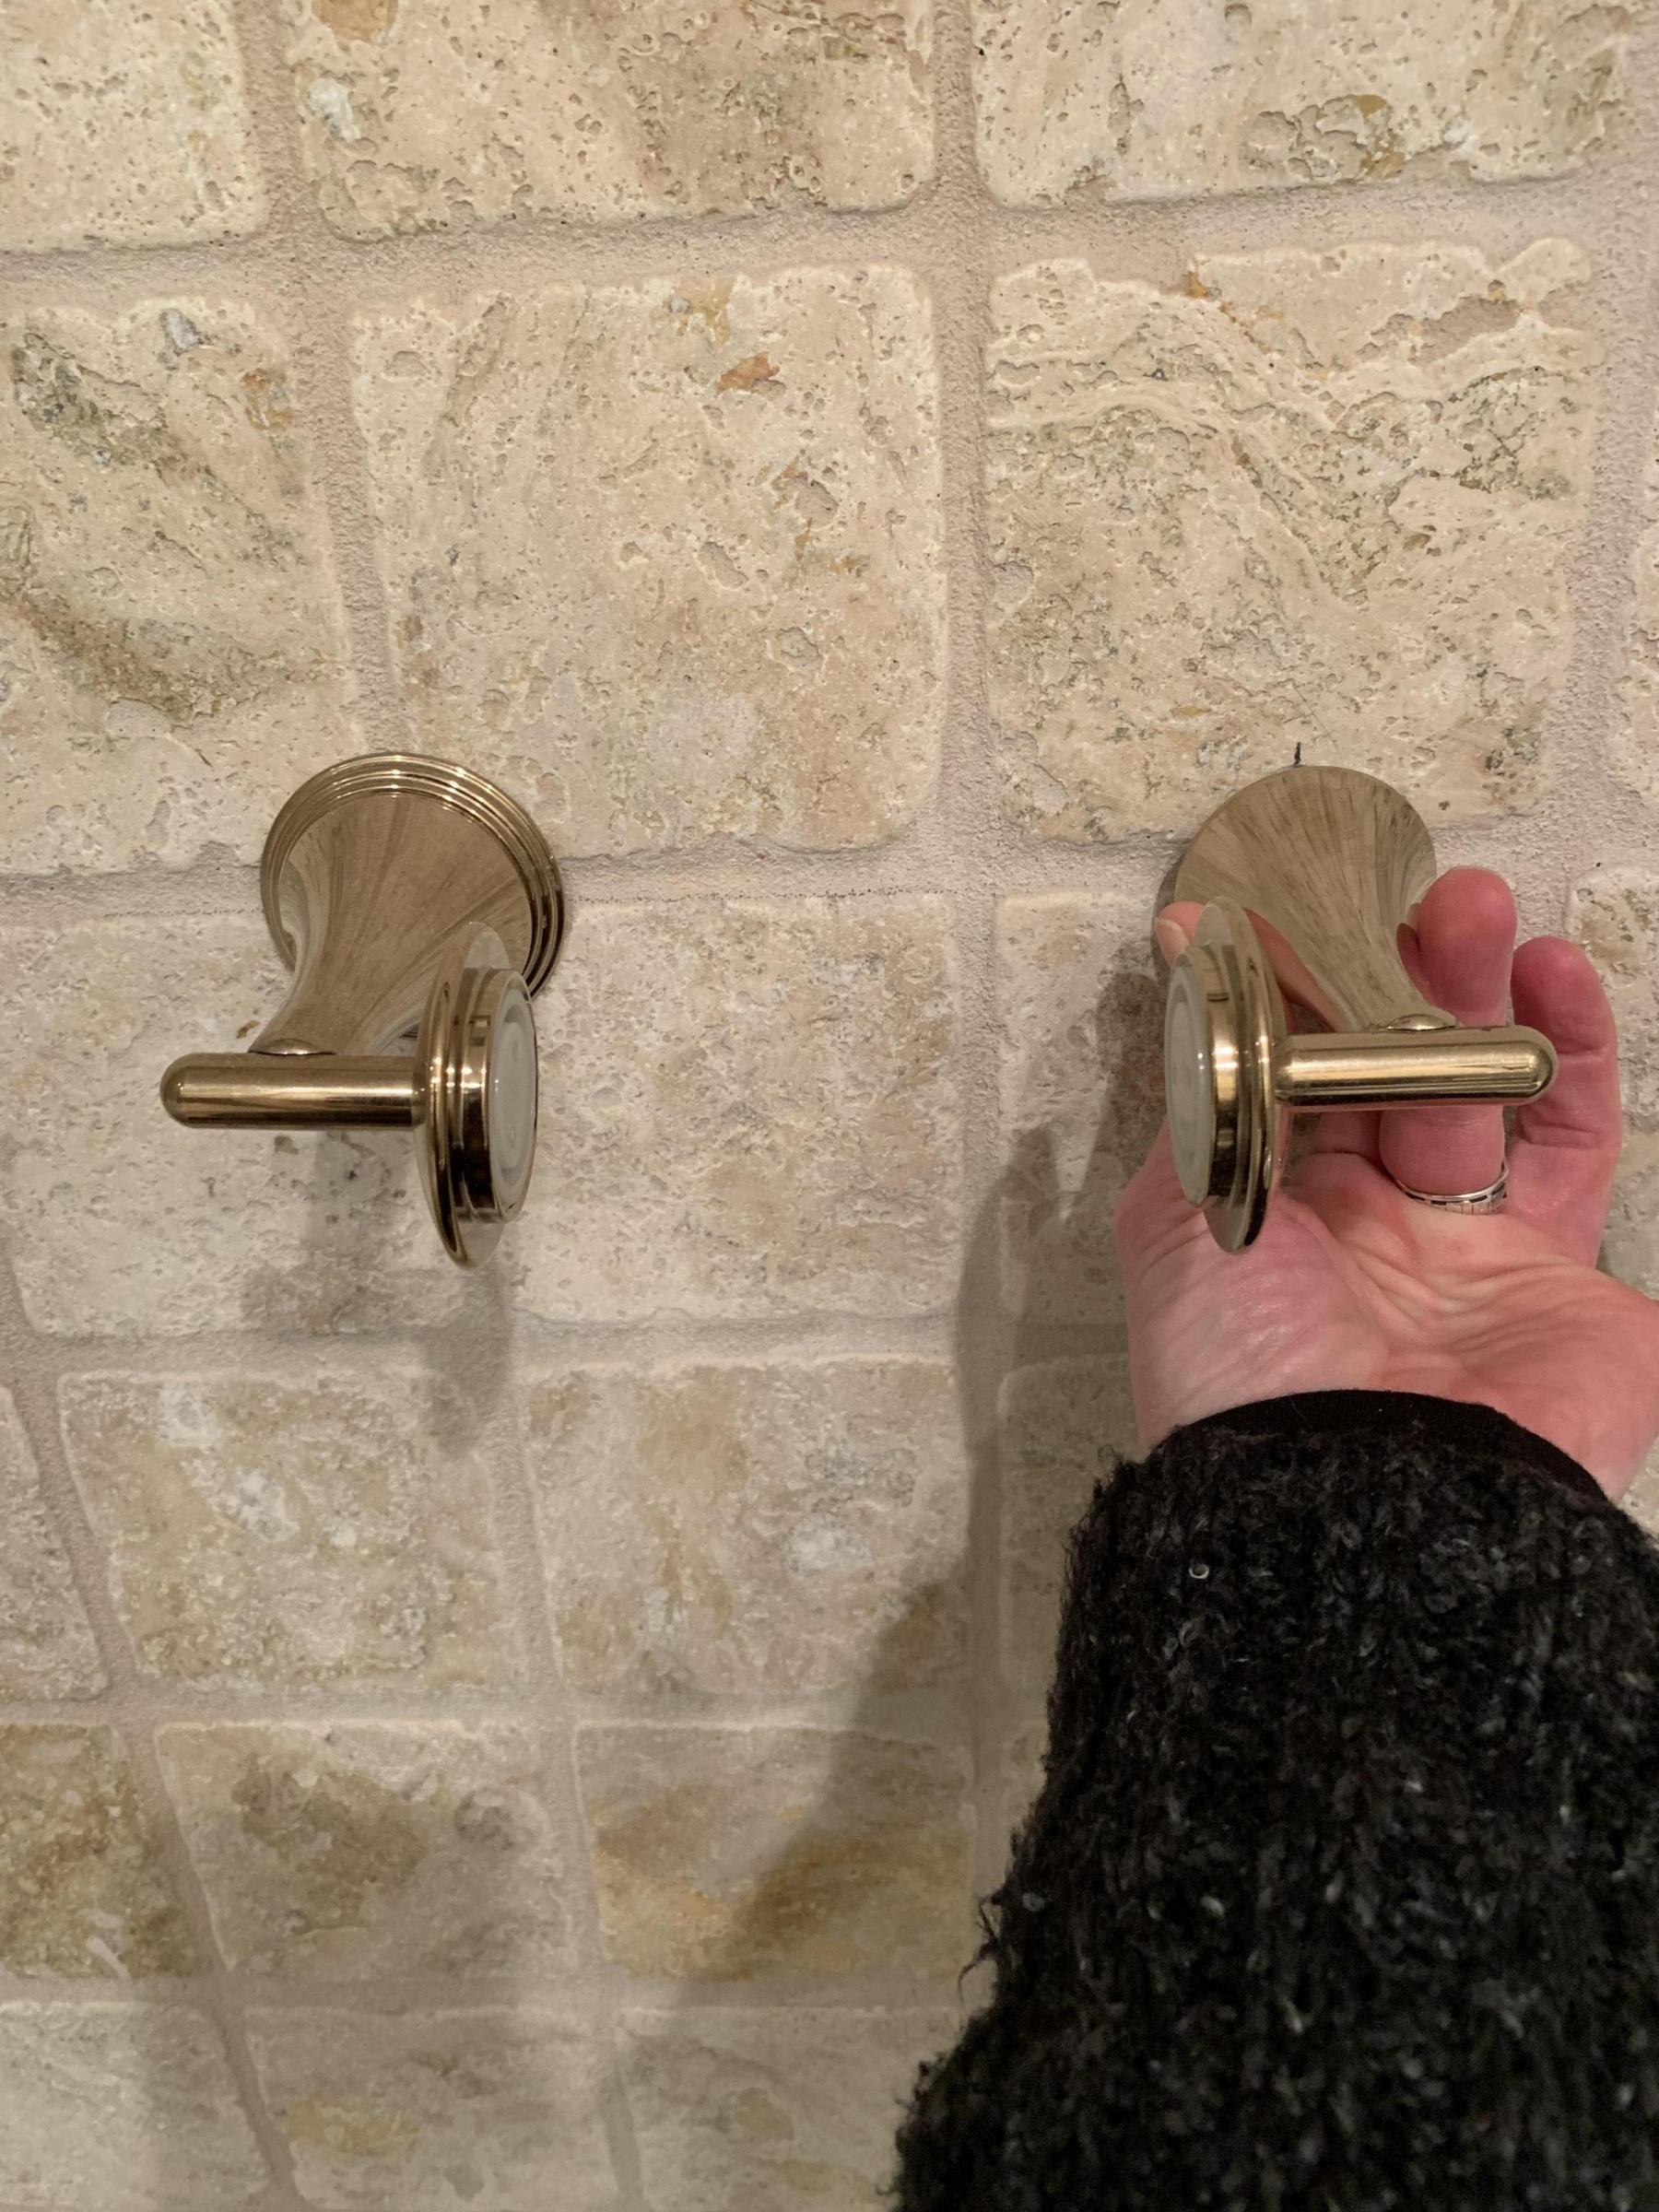 toilet paper holder without bar-e27ea1d7-236e-491f-bf8c-4c6507064e2e_1542600182767.jpg